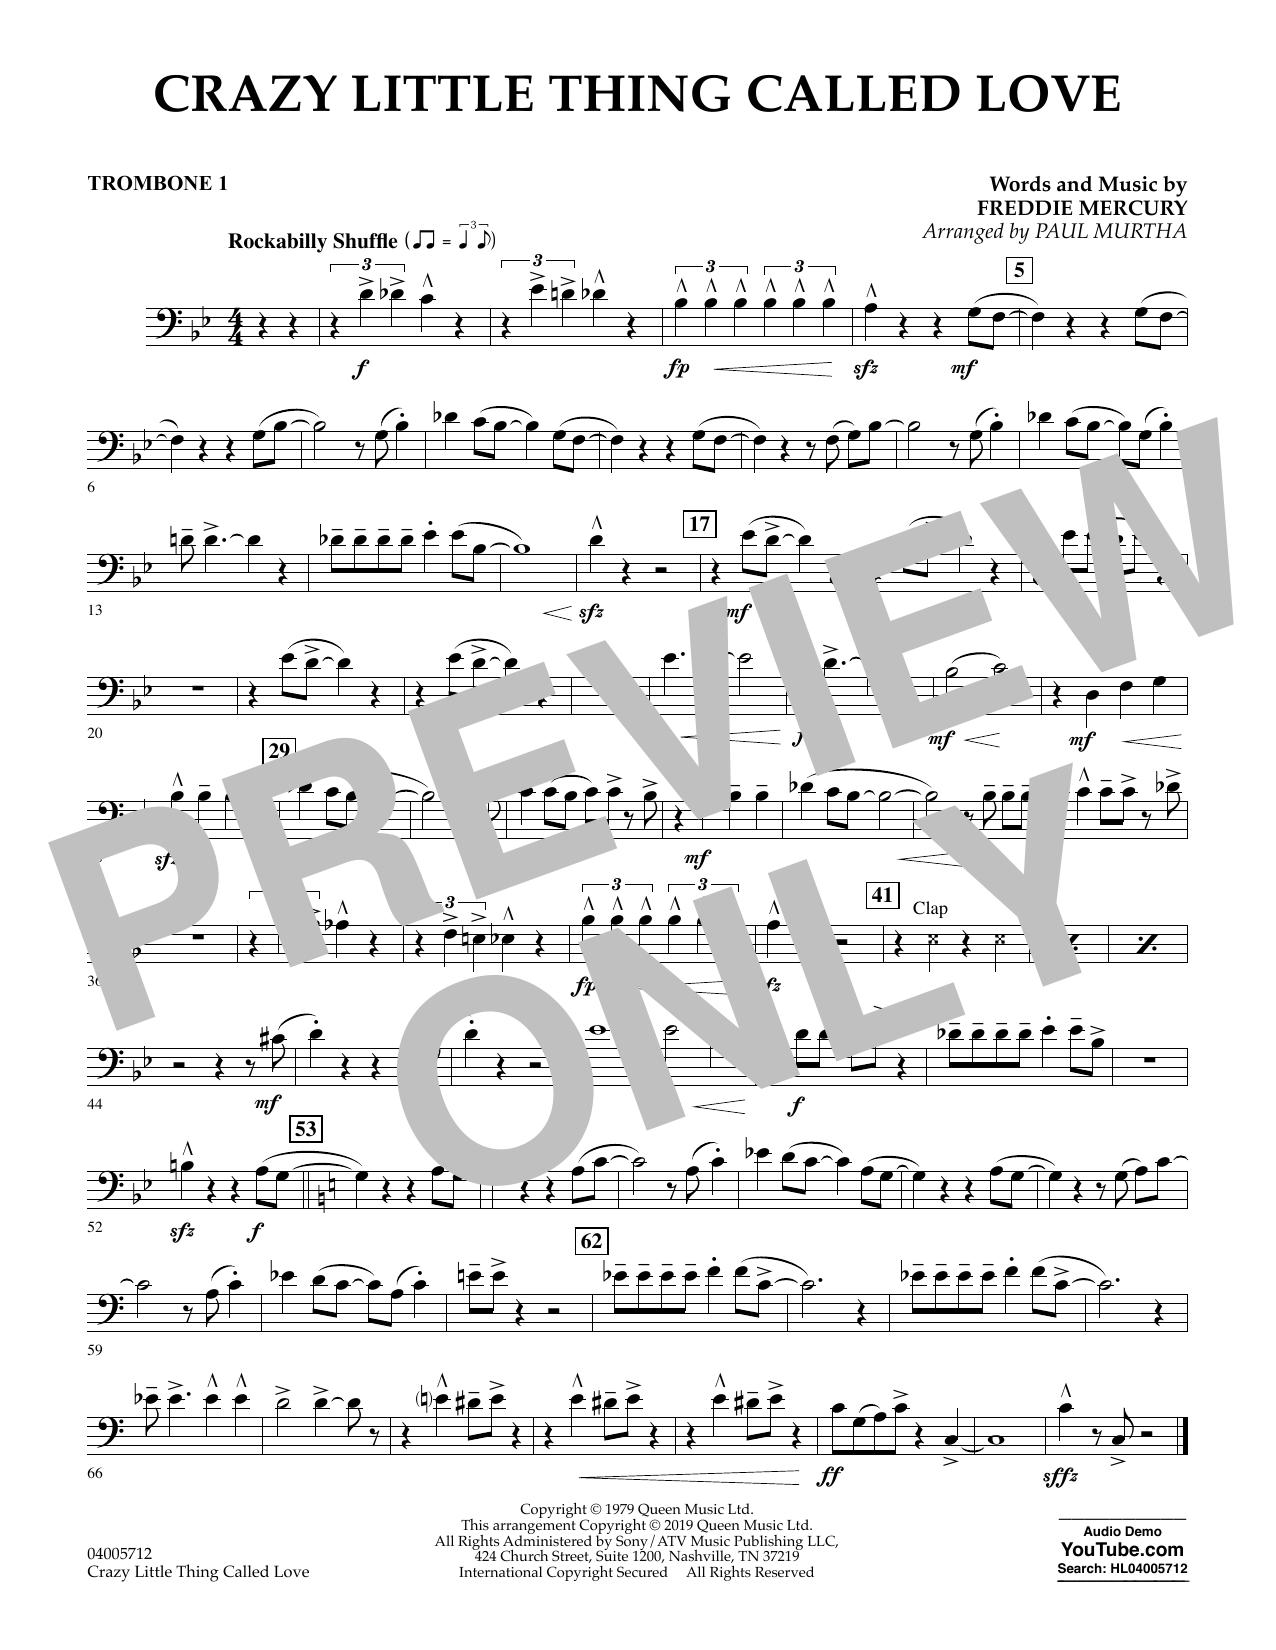 Crazy Little Thing Called Love (arr. Paul Murtha) - Trombone 1 (Concert Band)